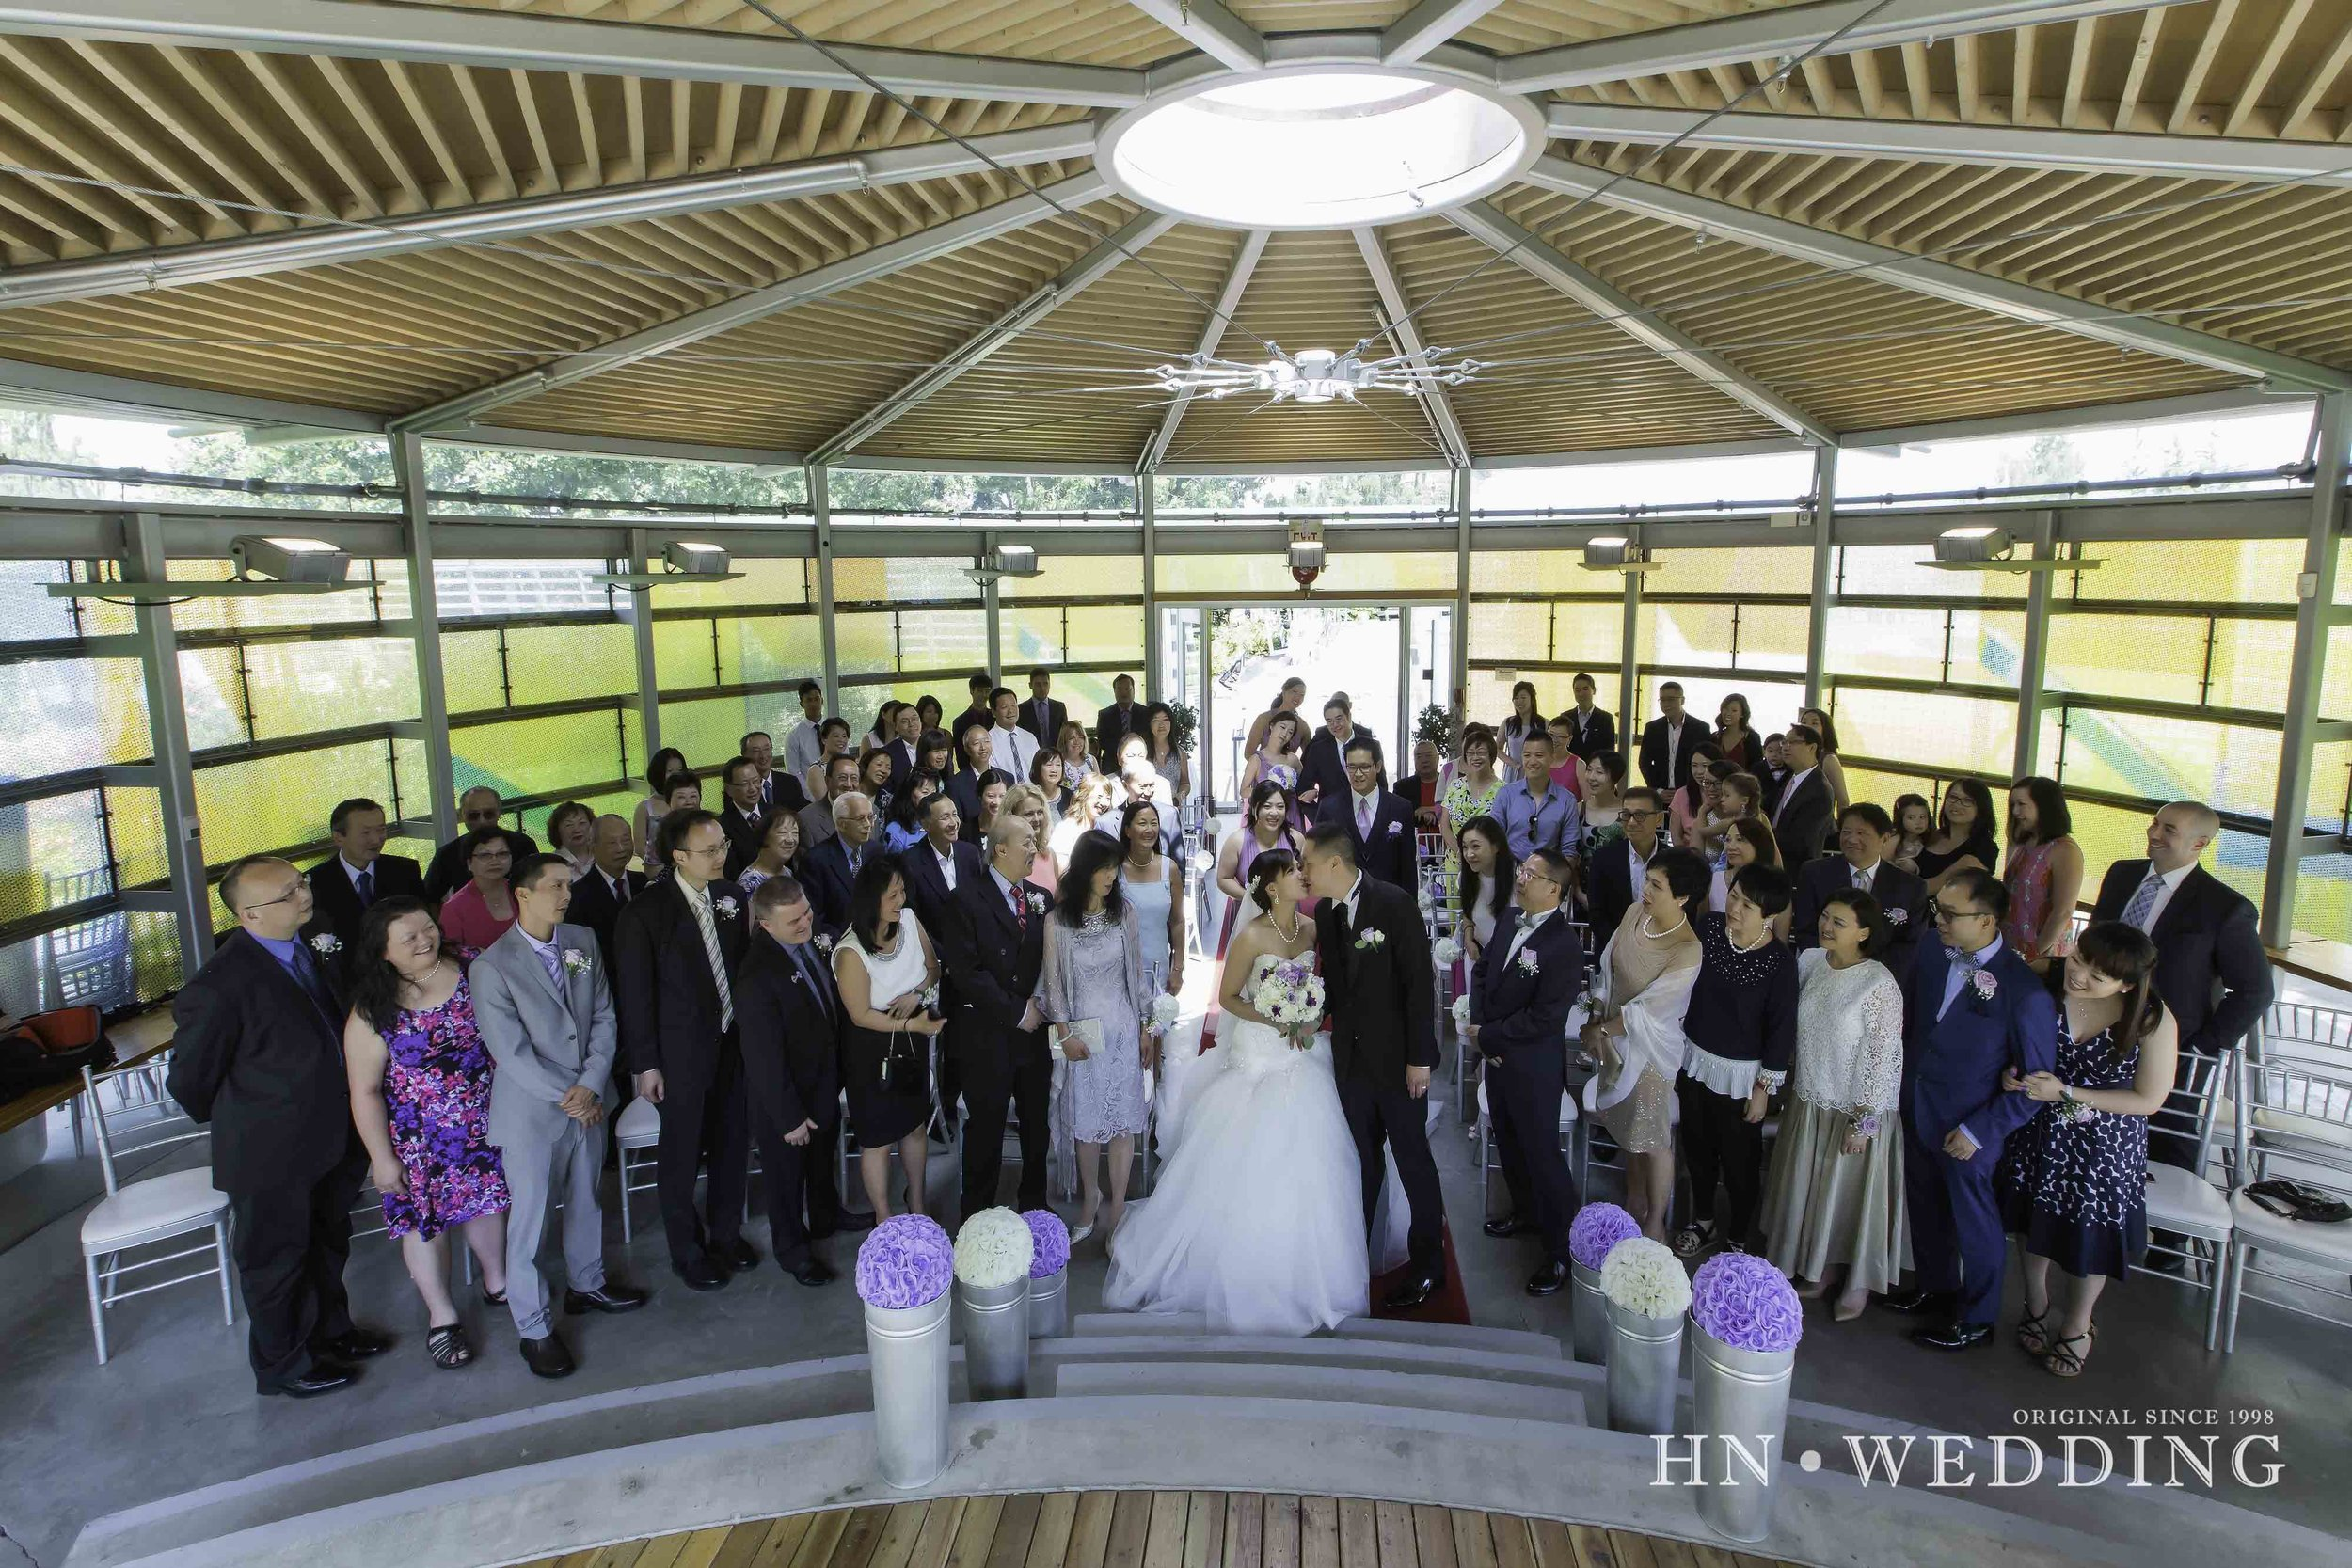 HNwedding-20160822-wedding-6274.jpg